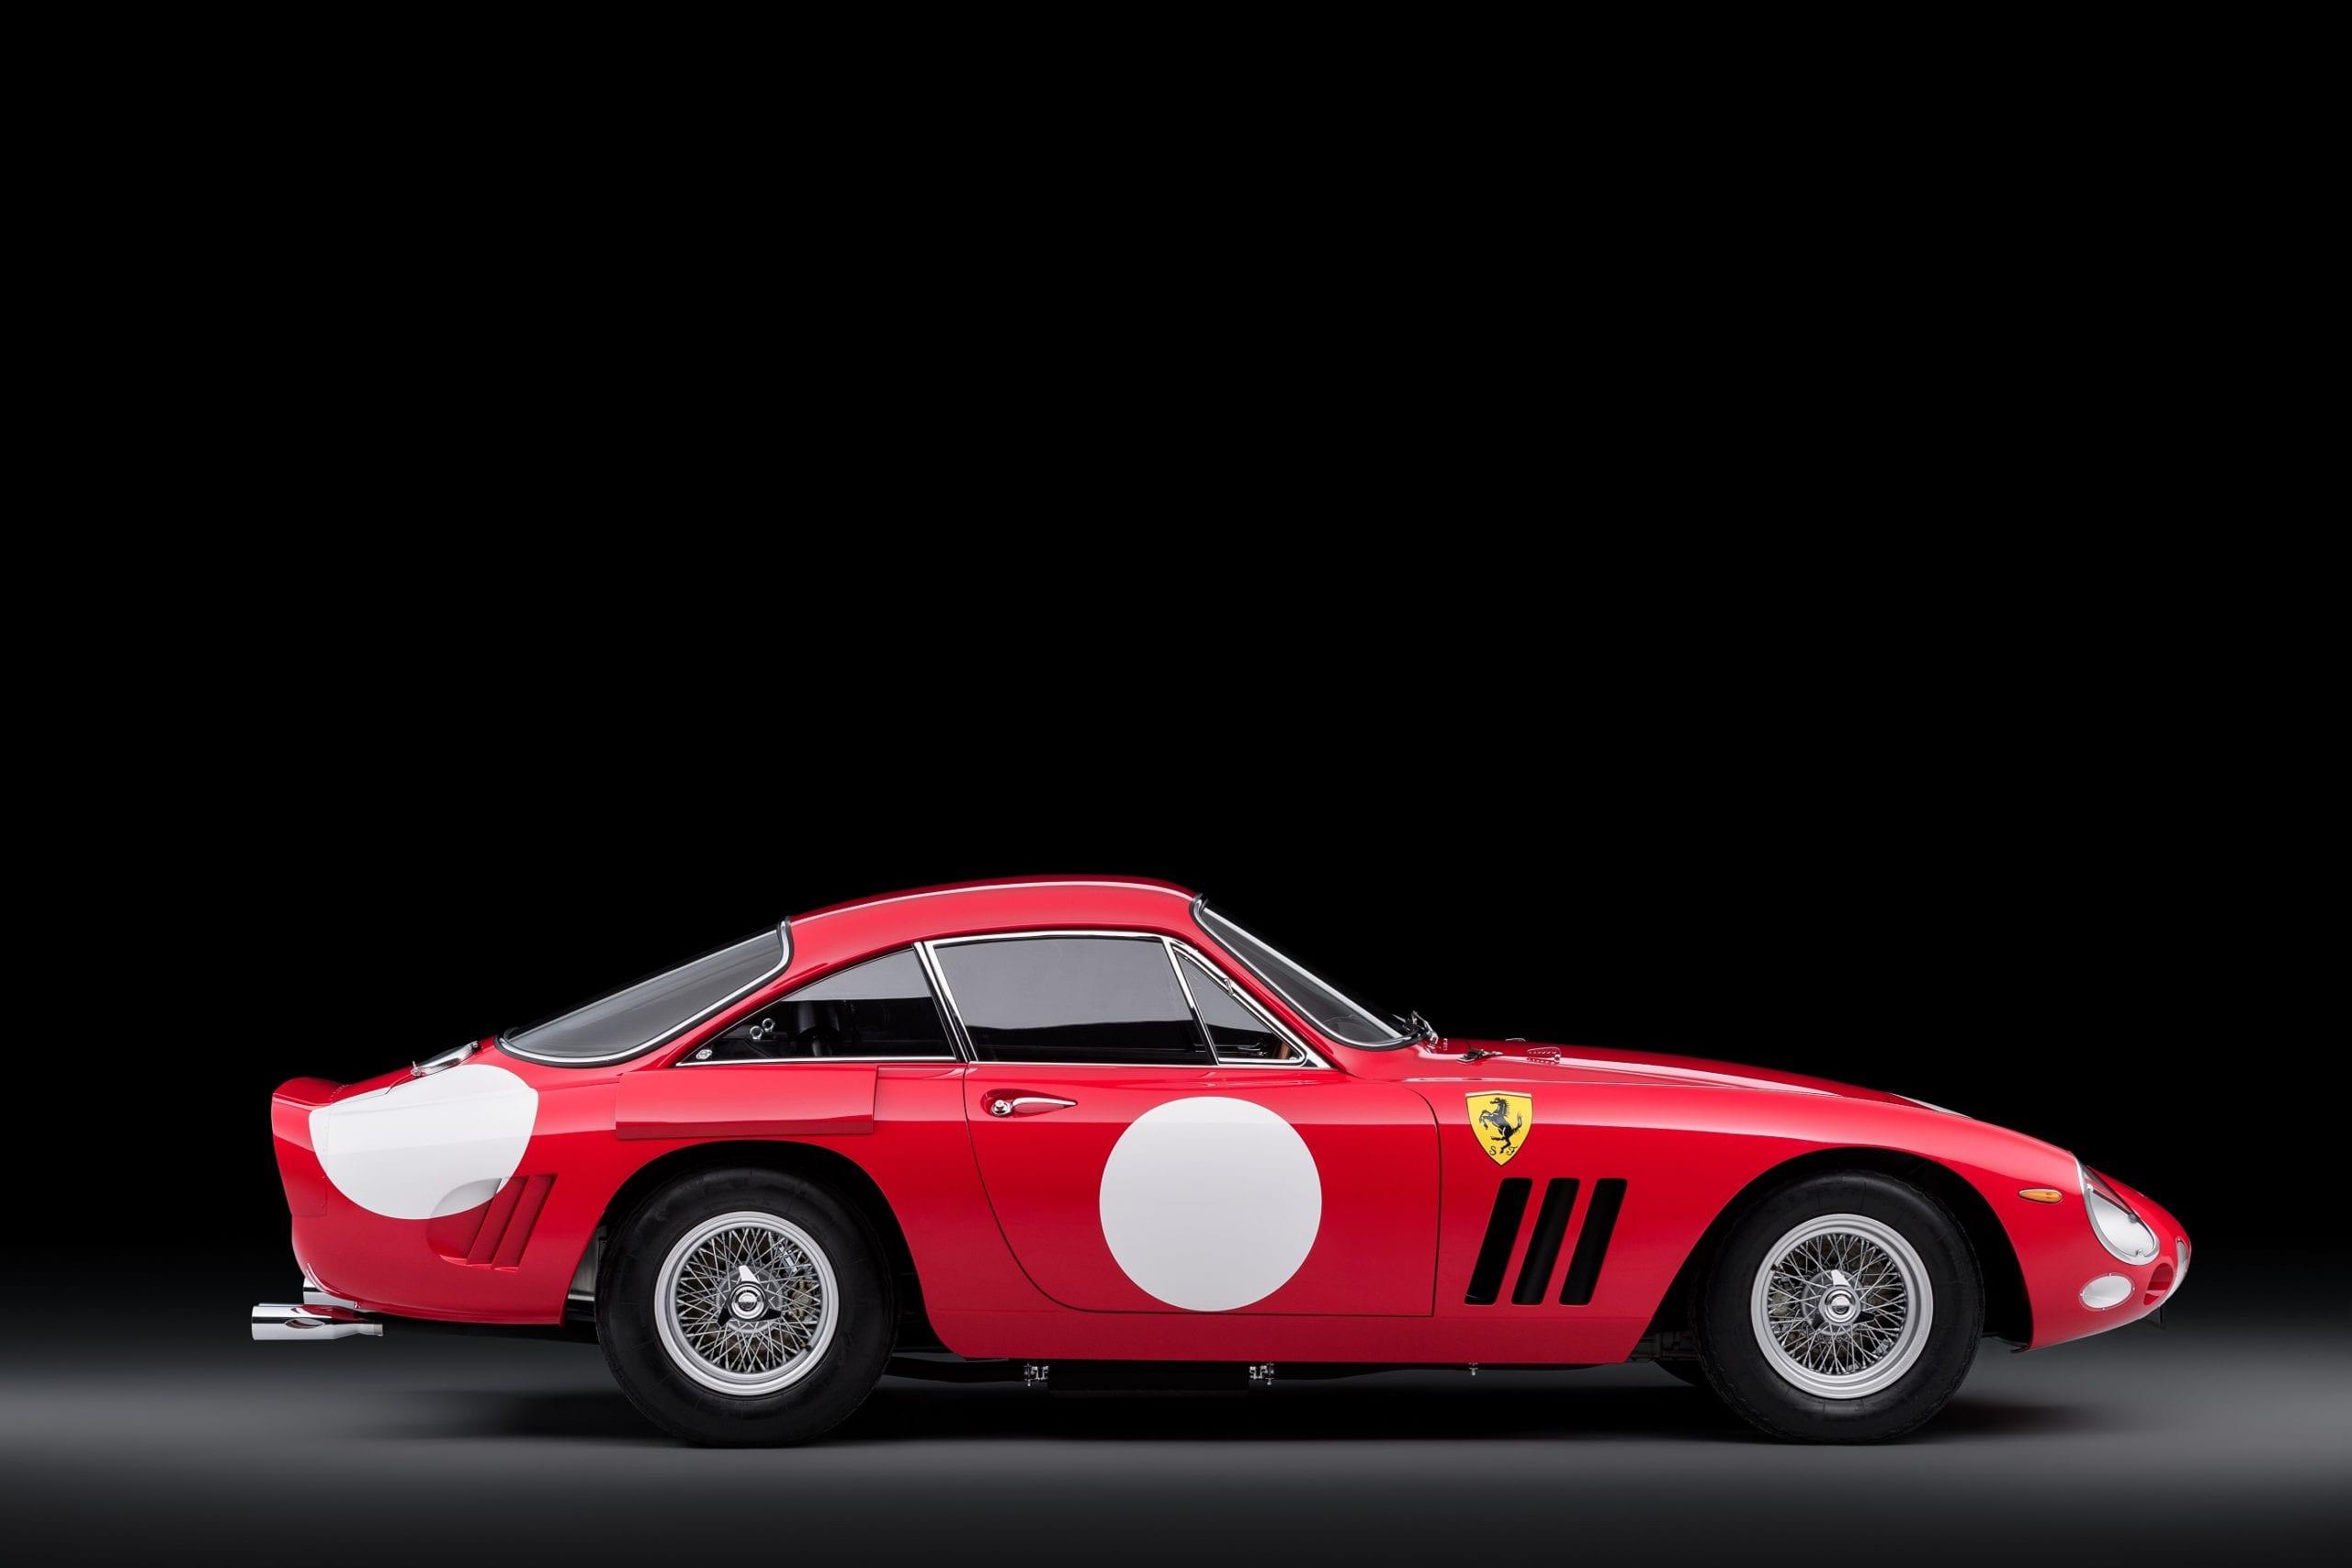 Bell Sport & Classic – Project Ferrari 330 LMB